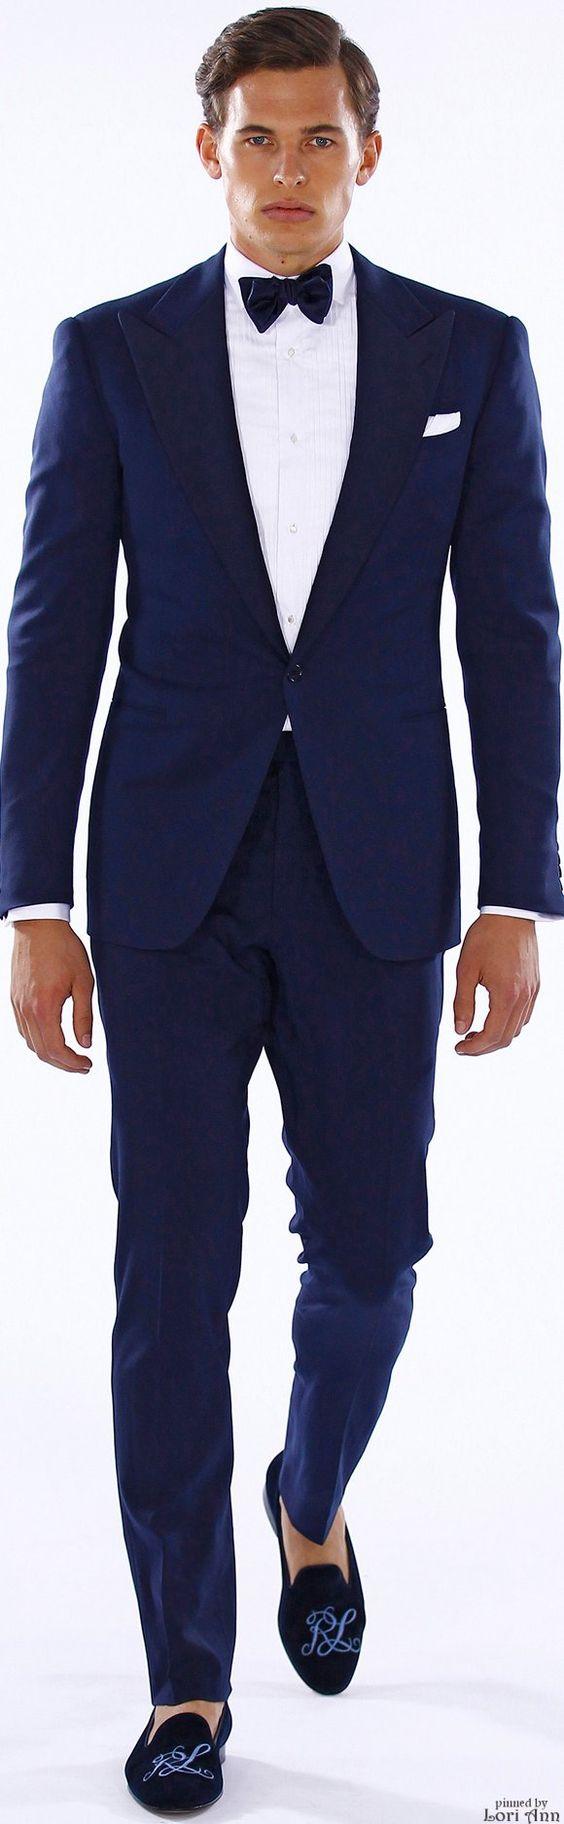 Ralph Lauren primavera 2016 traje azul con pajarita y slippers bordados. #saviler #pajaritas #tendencias #modahombre #accesoriosmasculinos #modamasculan #fashion